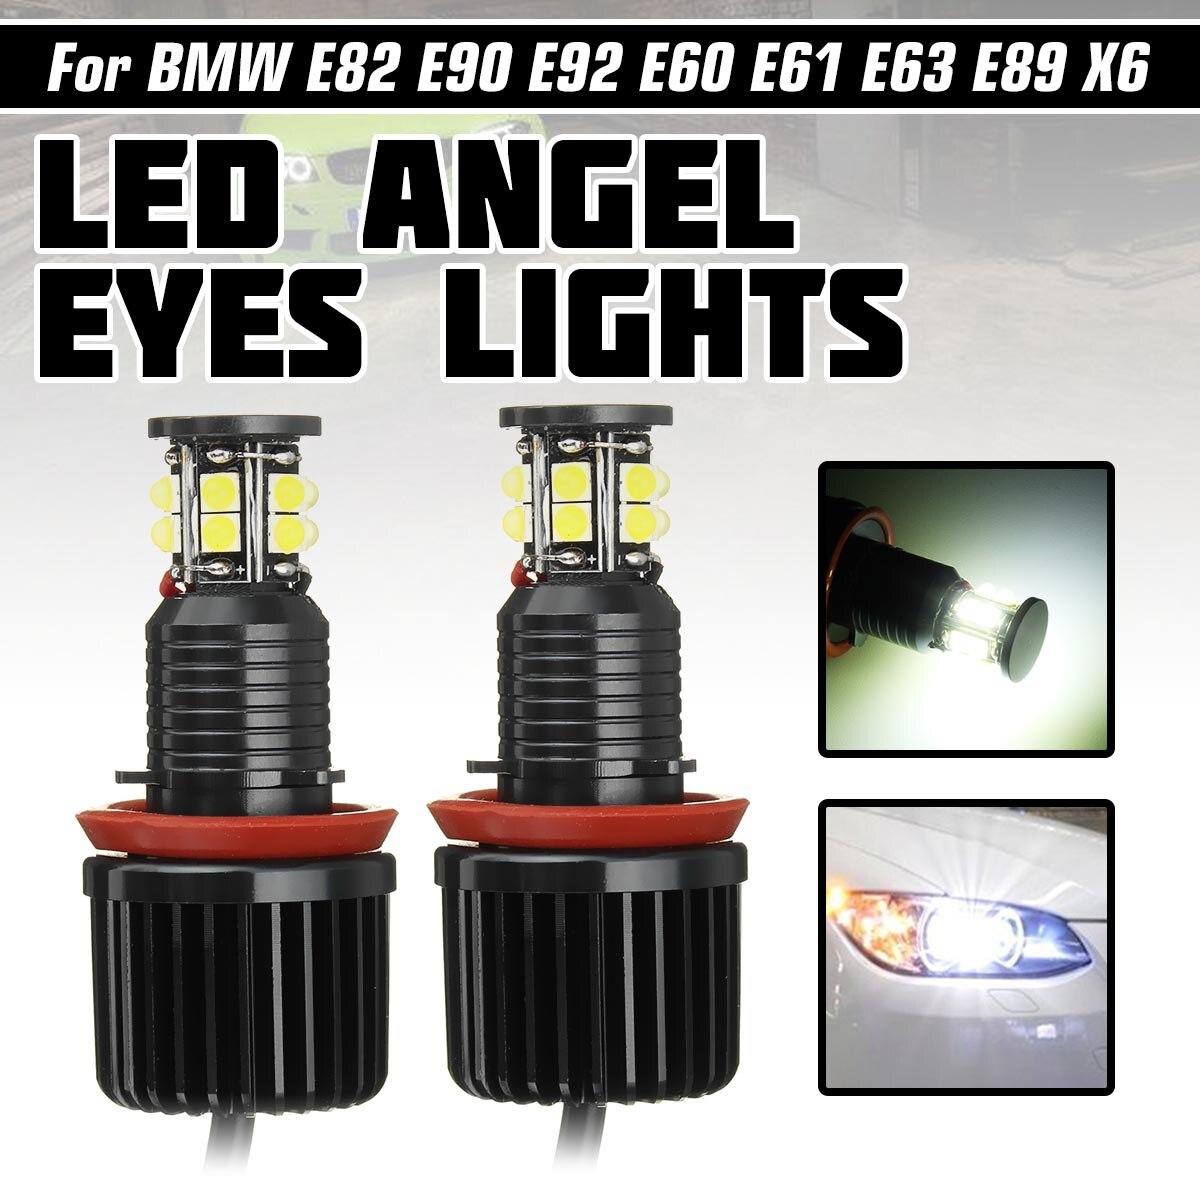 2x 120W H8 Angel Eye Halo Ring Light Auto Lighting 6000K For BMW E82 E87 E88 E90 E91 E92 E93 E60 E61 E63 E64 E84 X1 E70 X5 E89